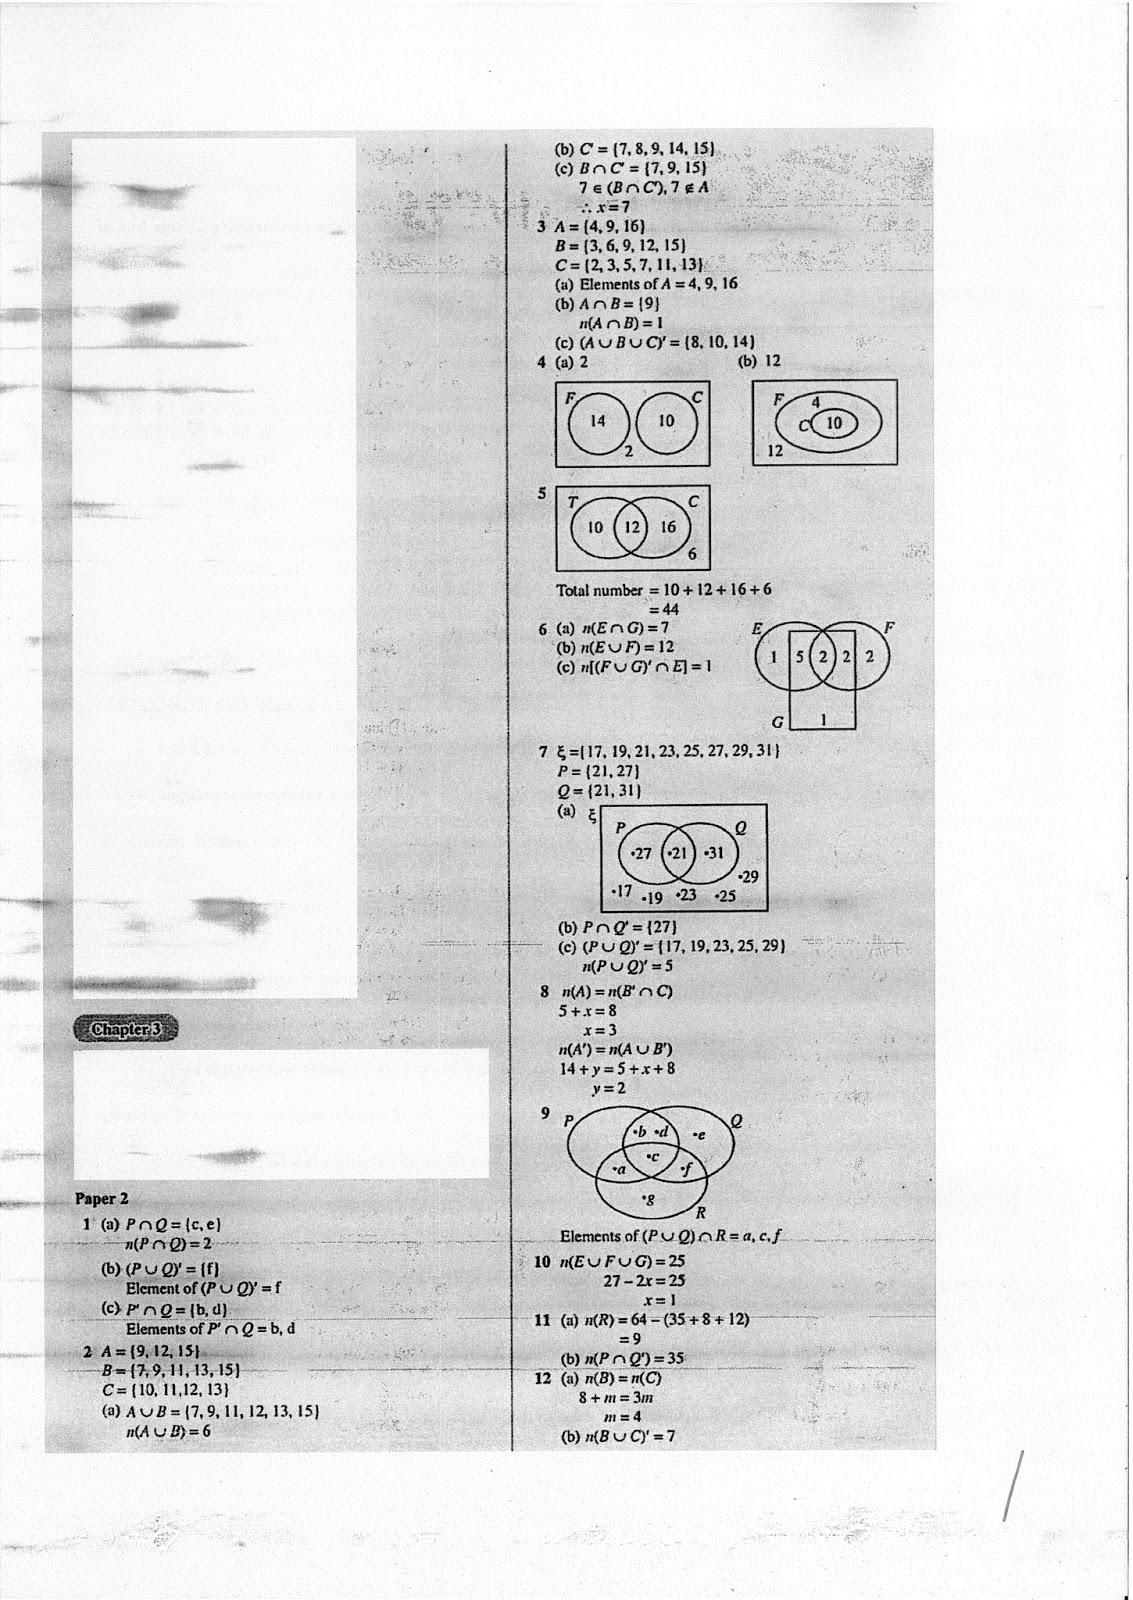 TTC MATHS DEPARTMENT: Form 4 Final Exam Reivsion Pack-Full